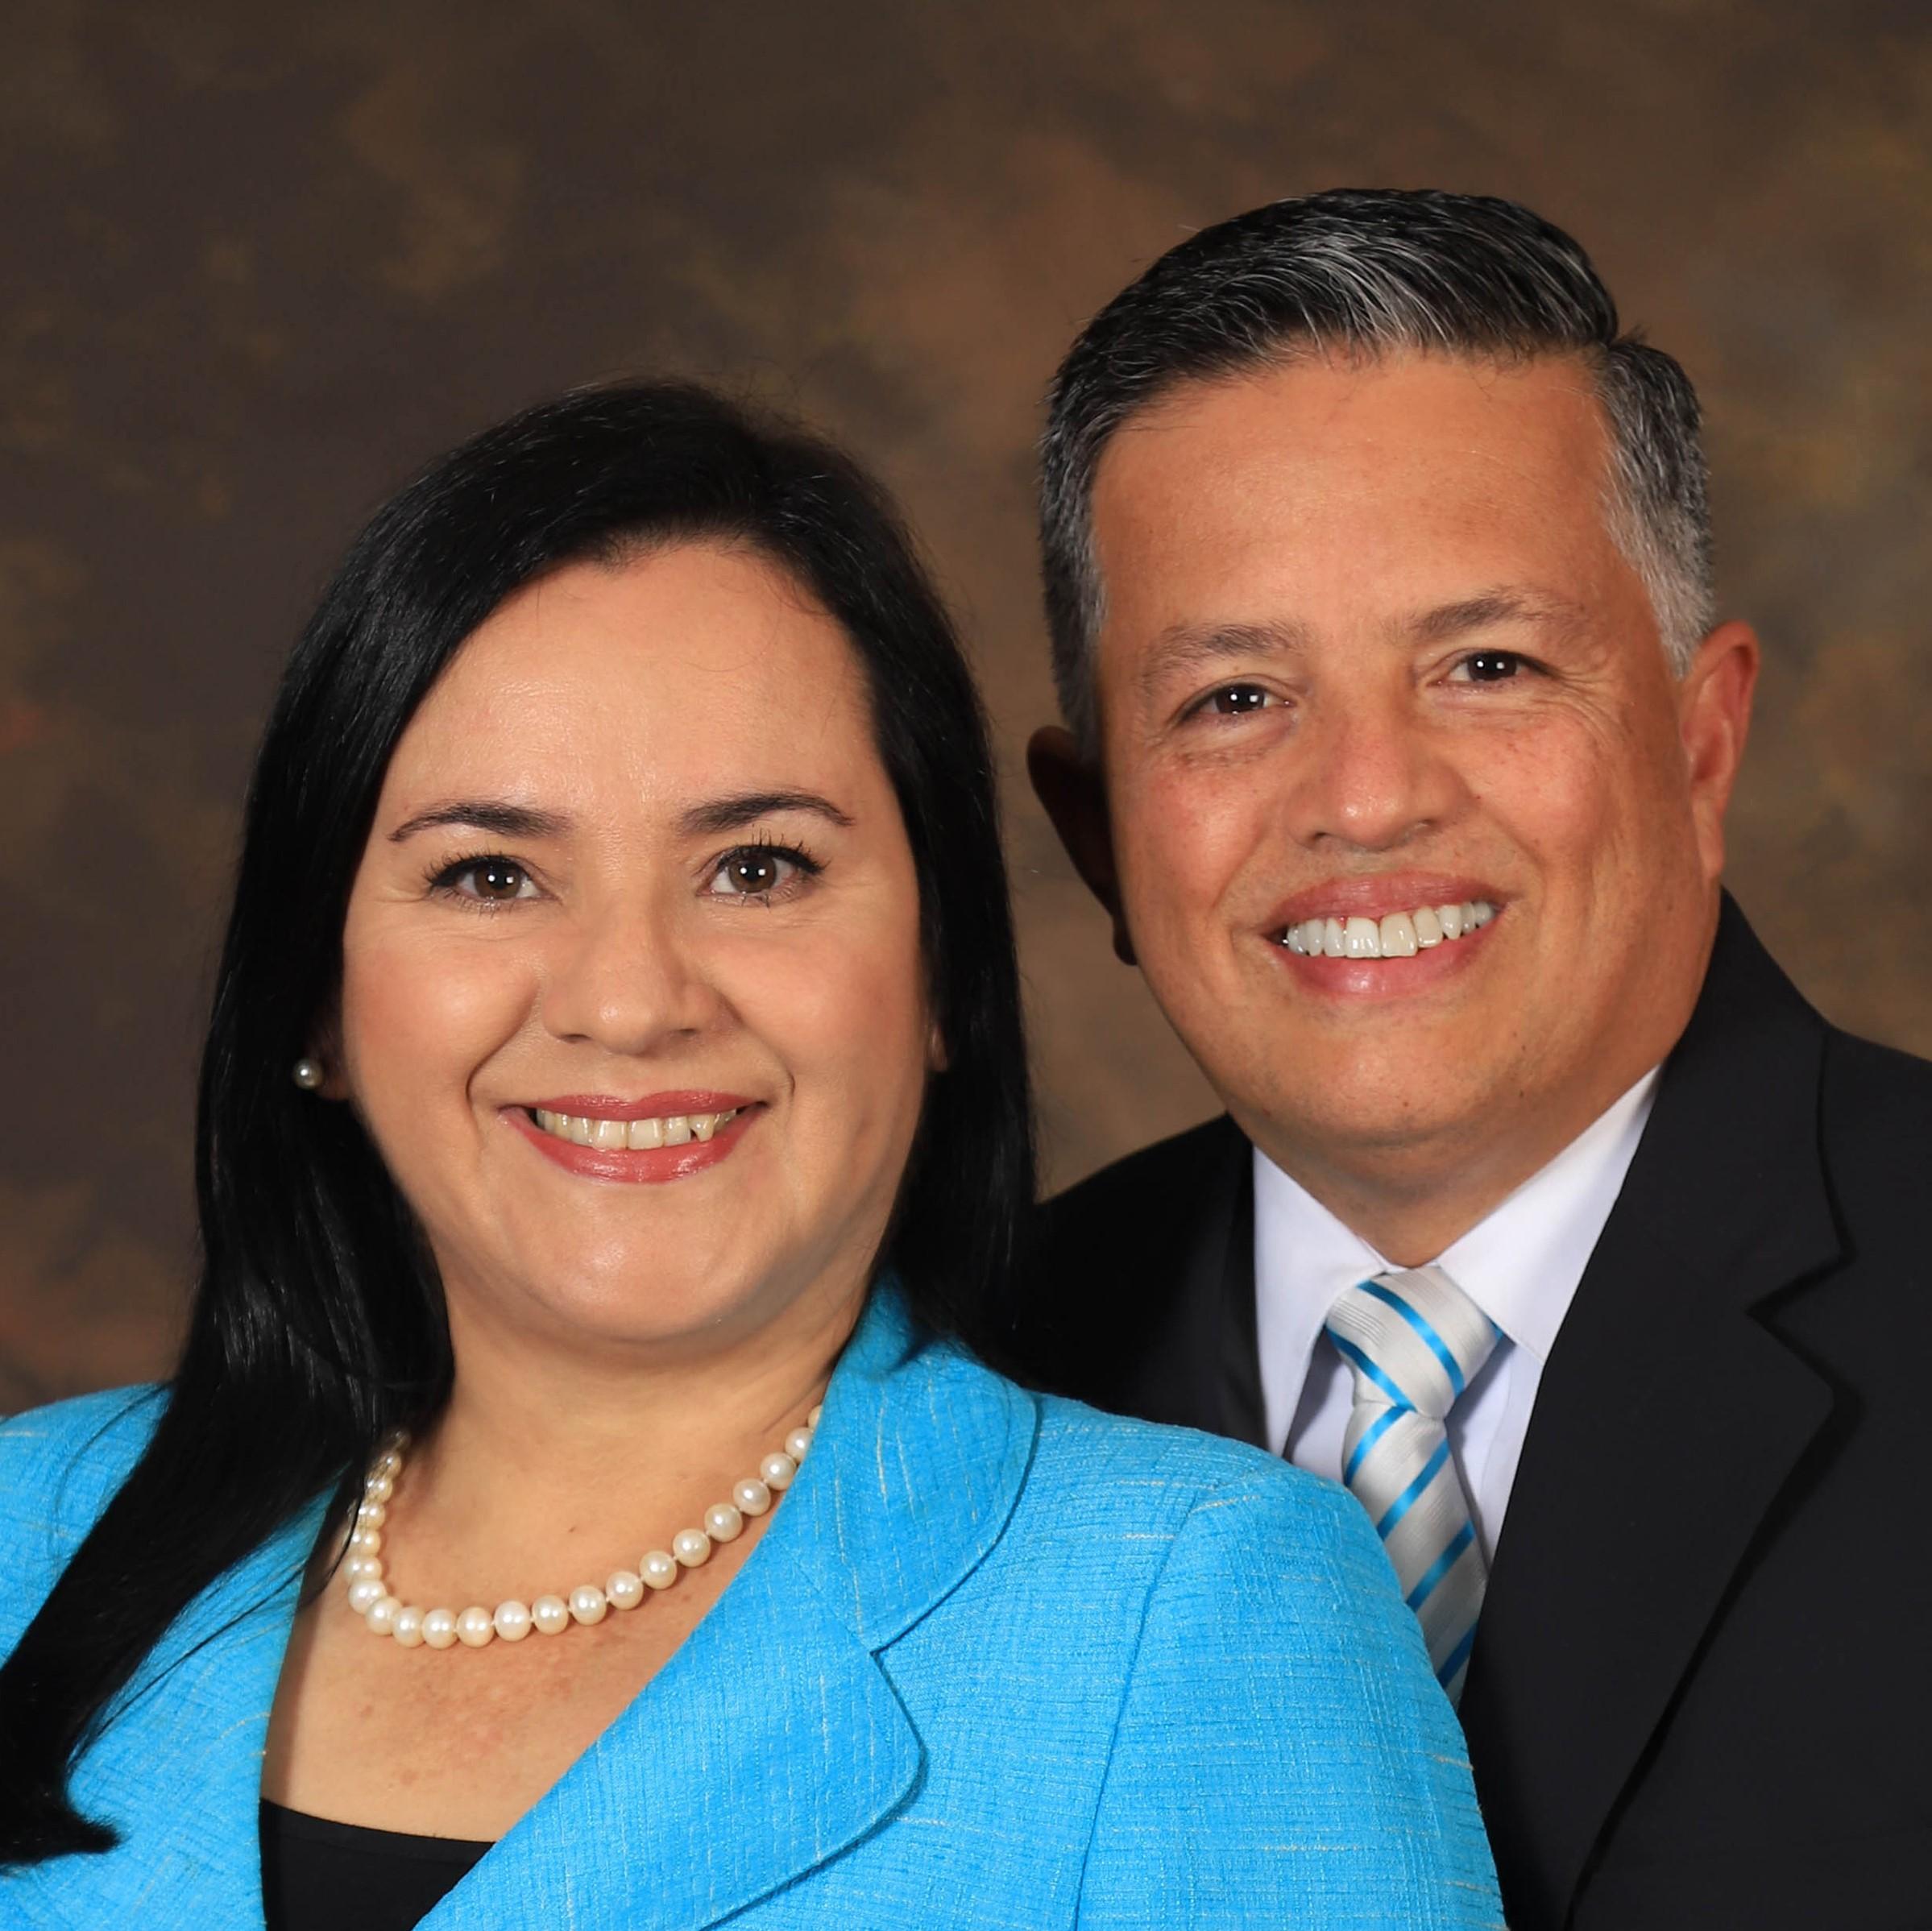 Maritza Muñoz and Rodrigo B. Soto Bolaños